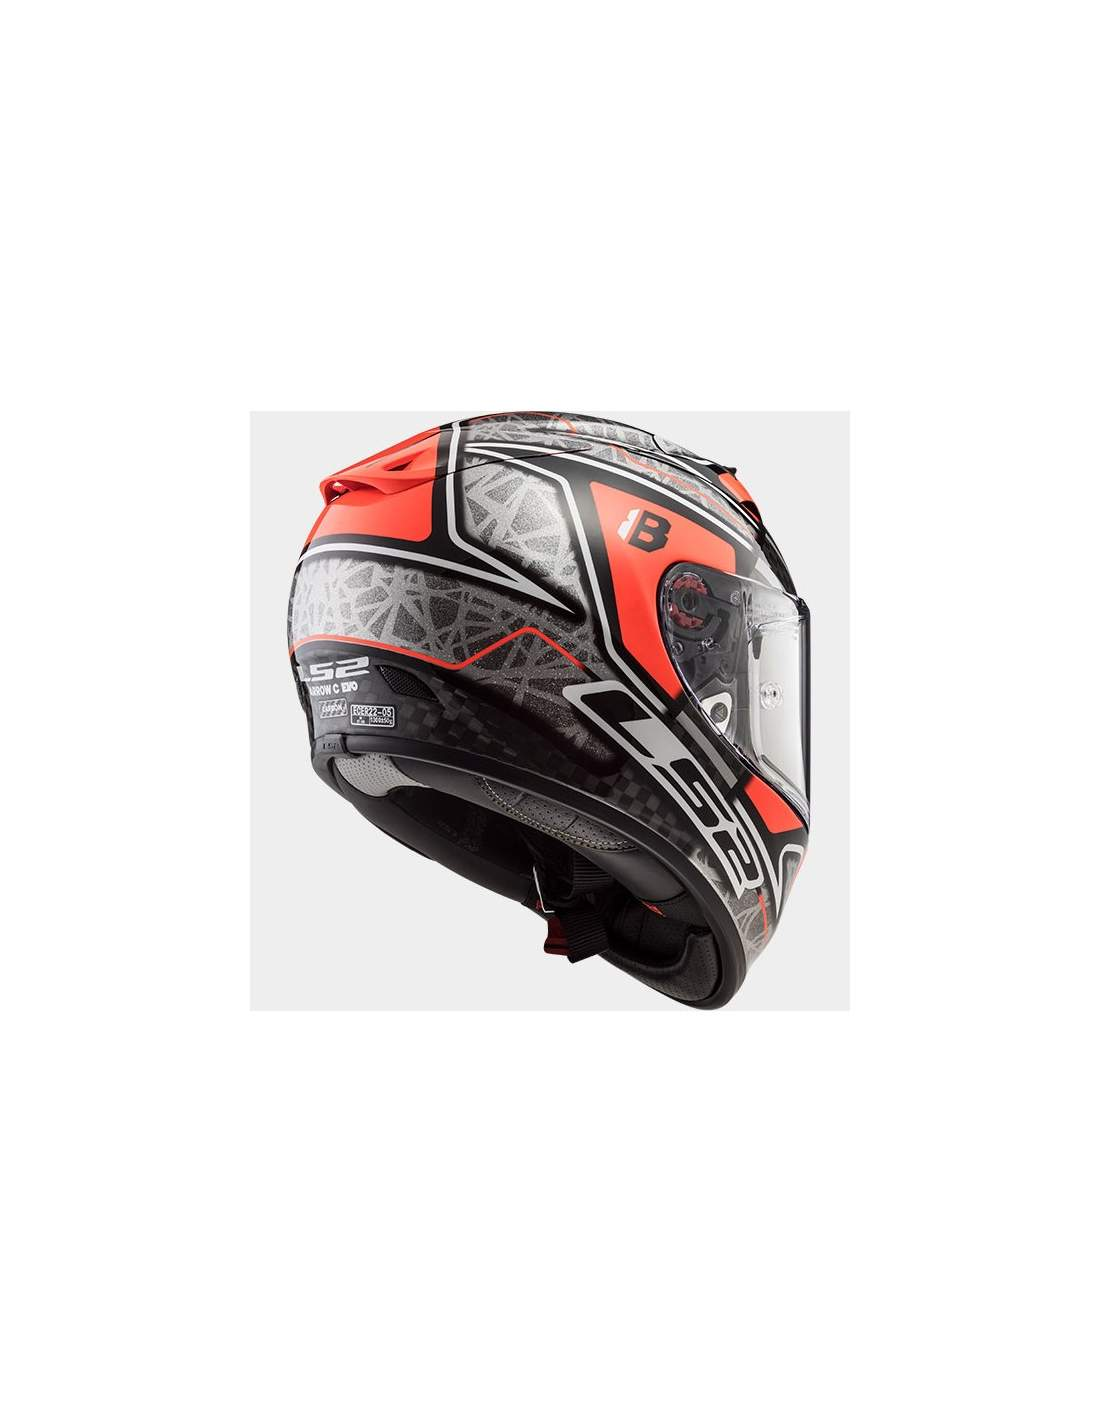 Gloss Carbon LS2 Casco Moto Ff323 Arrow C Evo L